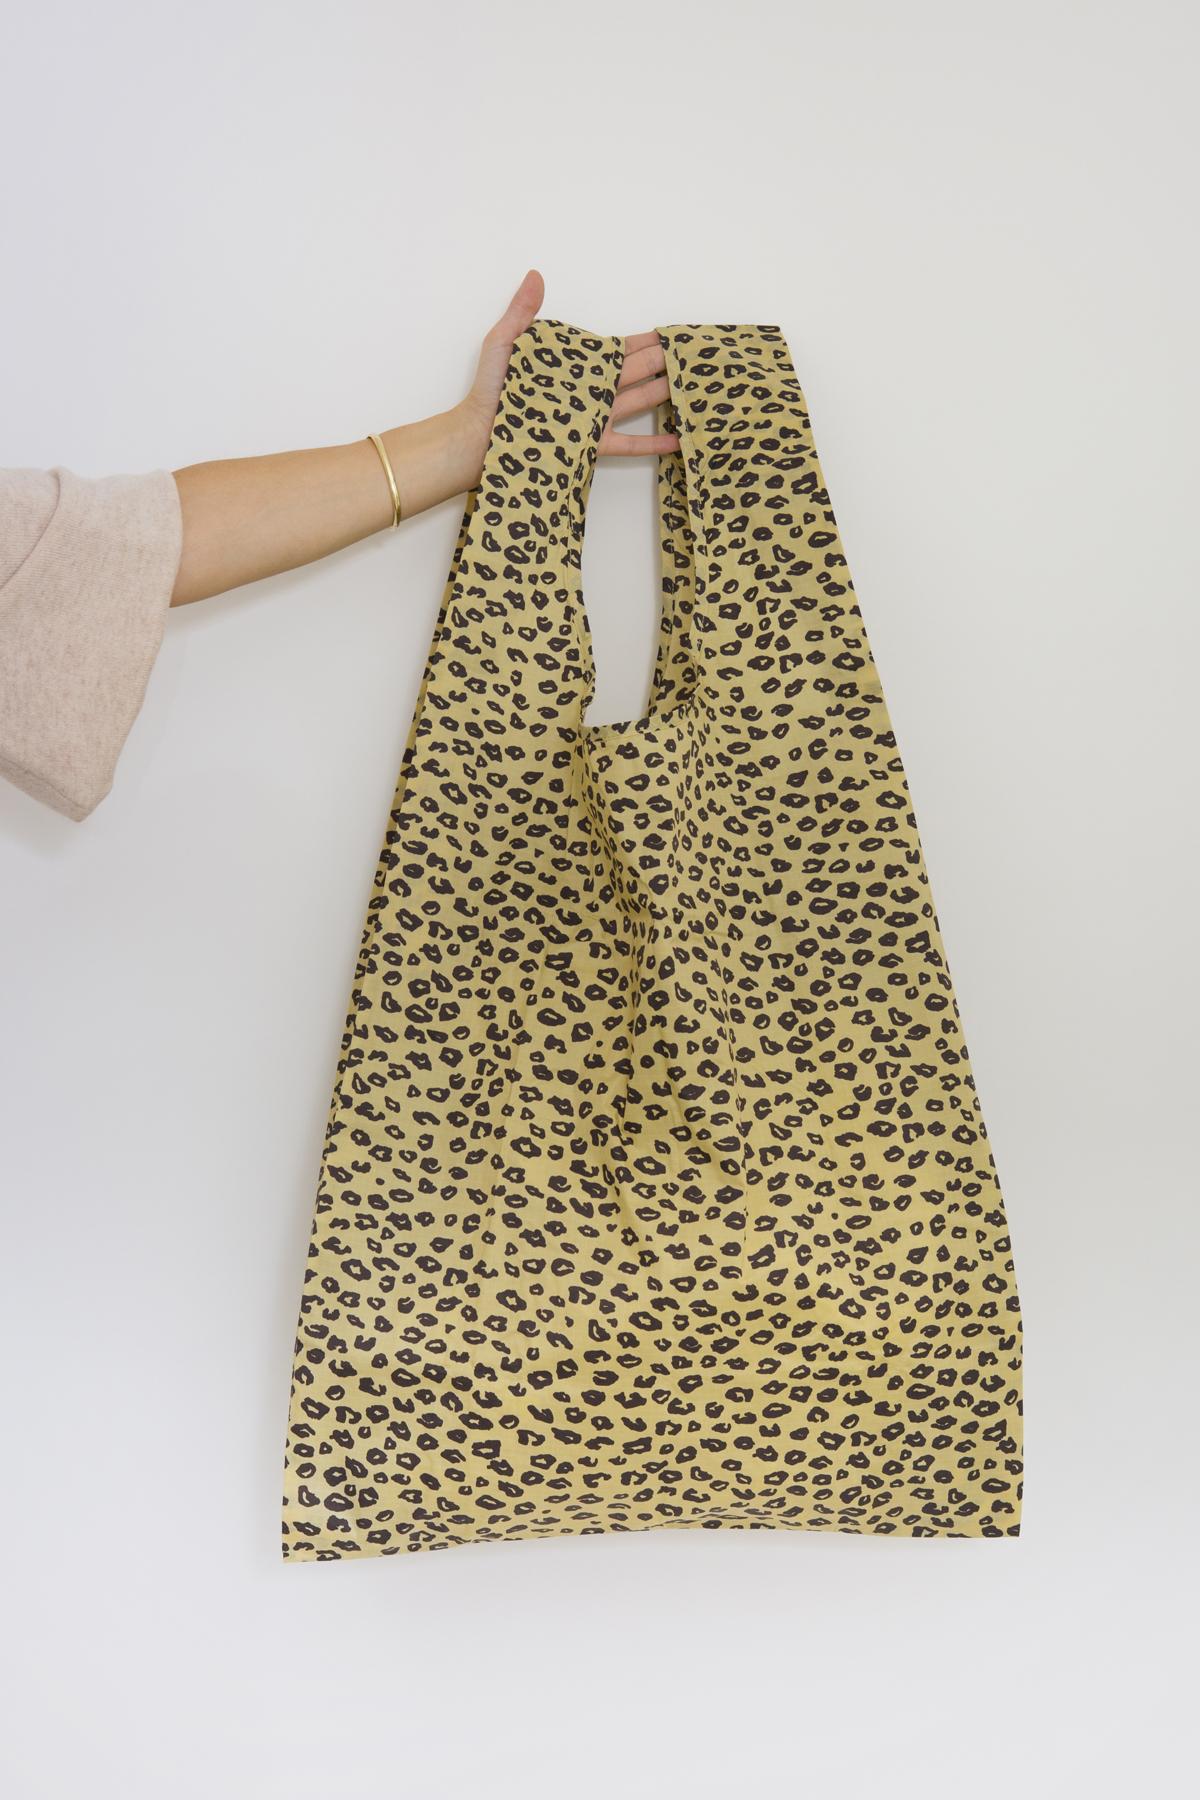 big-leopard-bag-baggu-reusable-shopping-matchboxathens